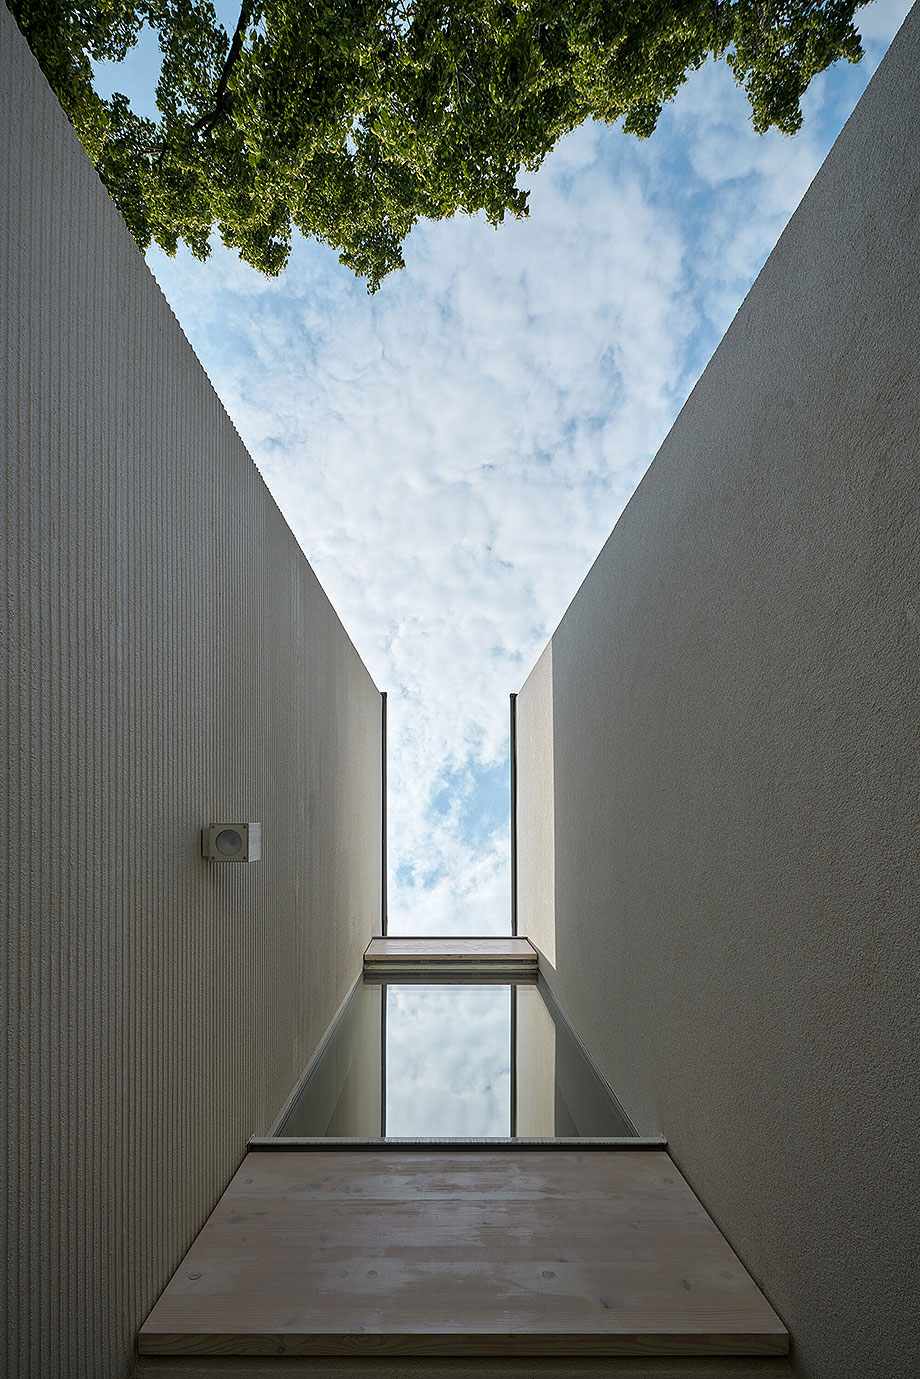 casa lhotka en praga de soa architekti y richter design (2) - foto boysplaynice